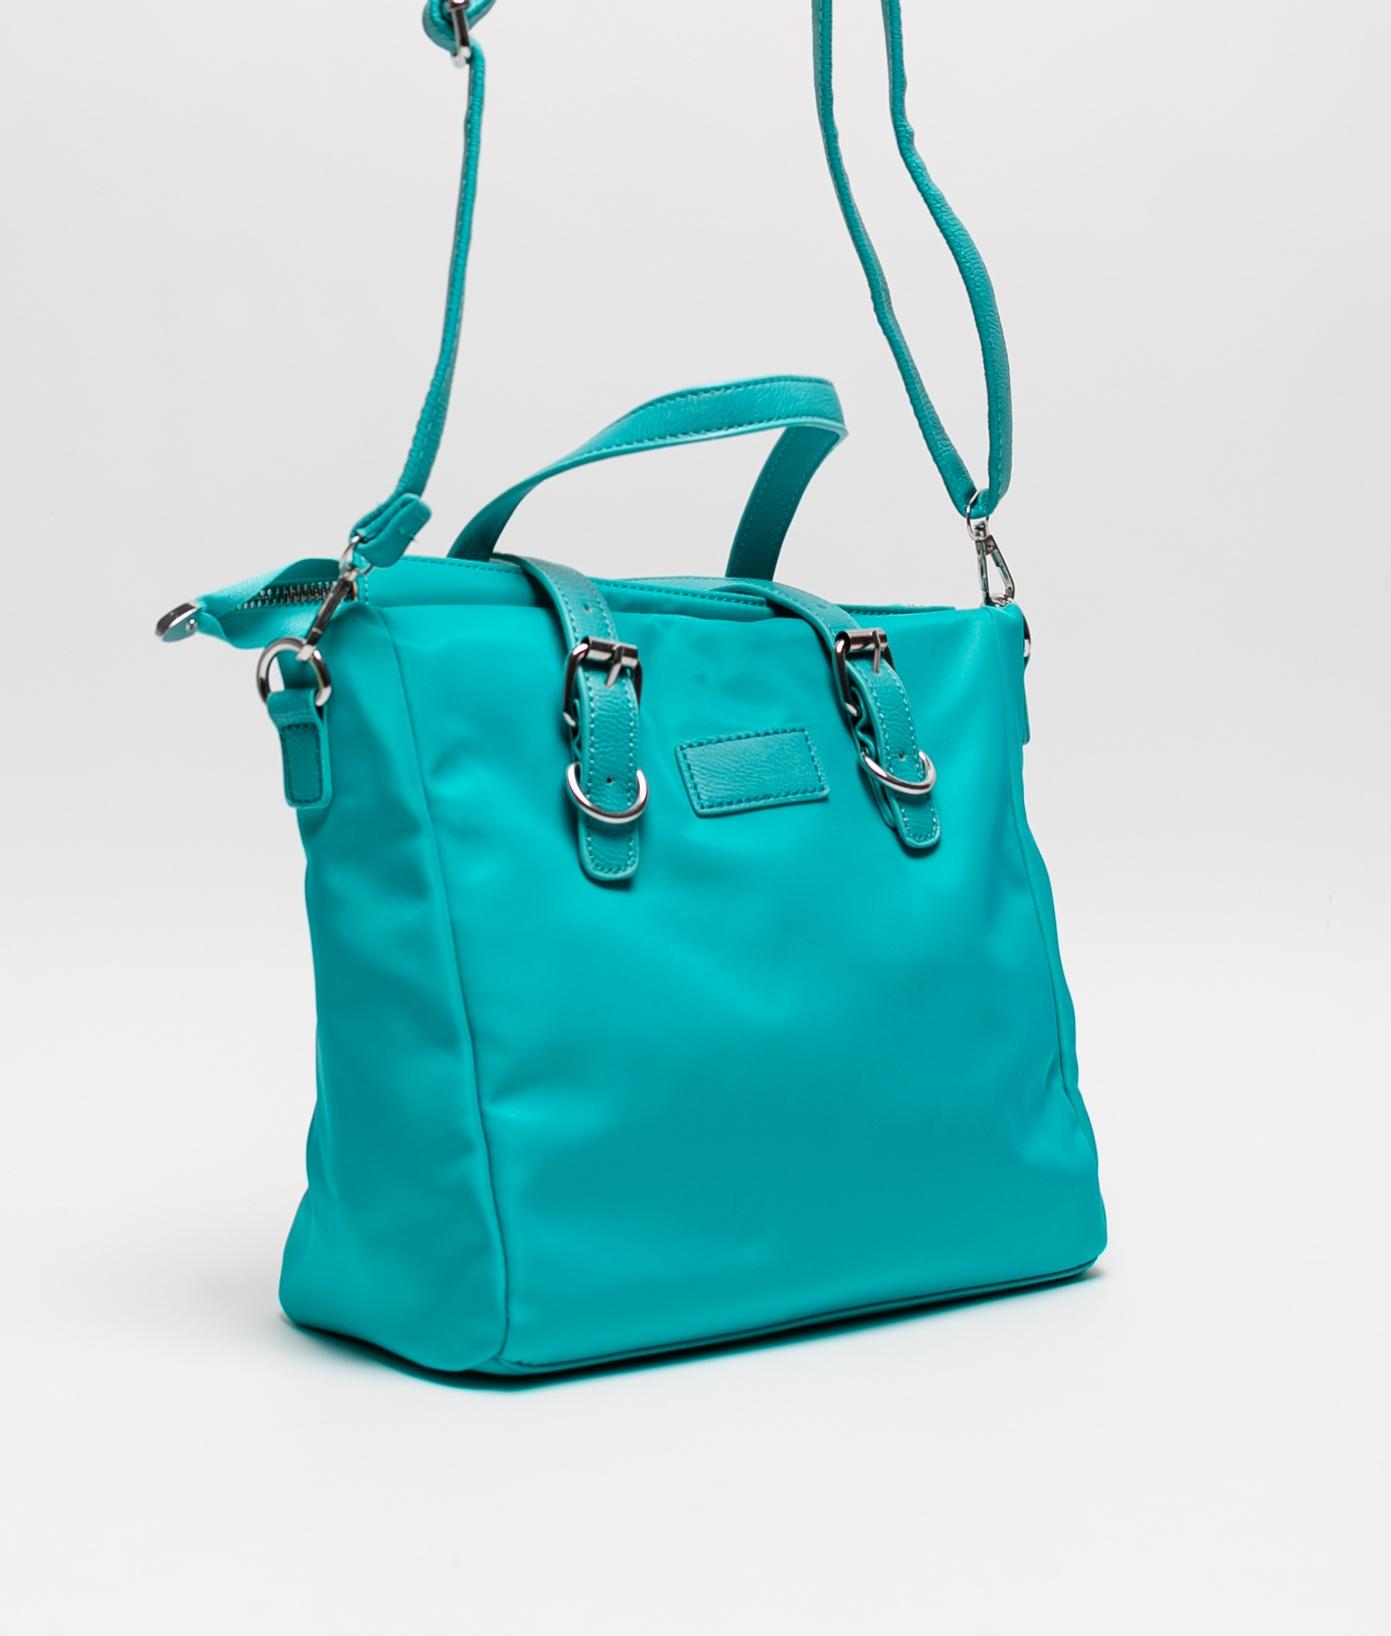 IFATY BAG - BLUE